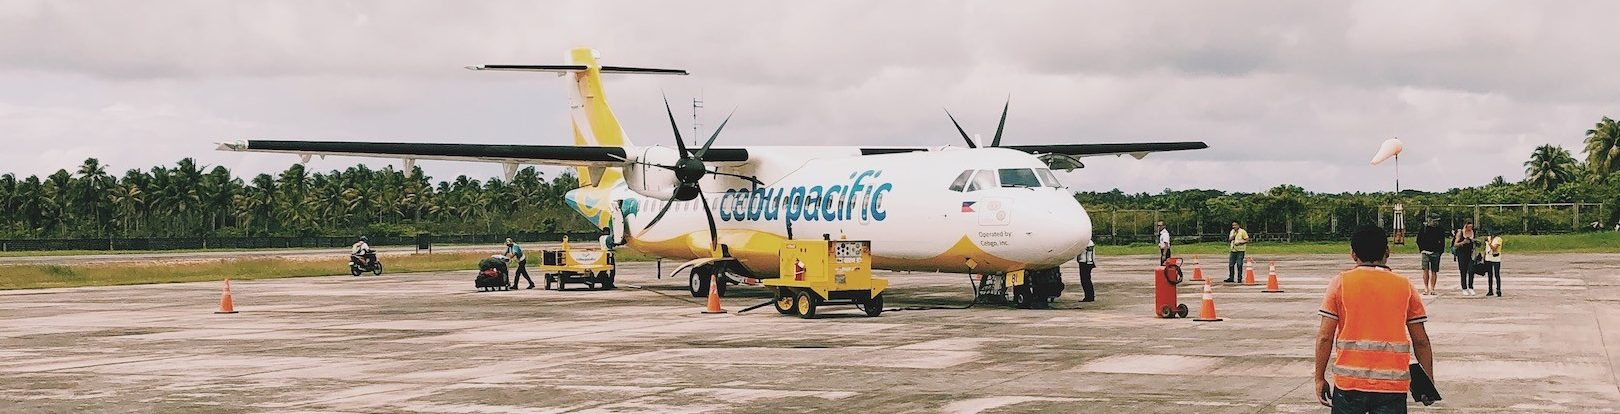 plane cebu pacific air Solon Travel Philippines